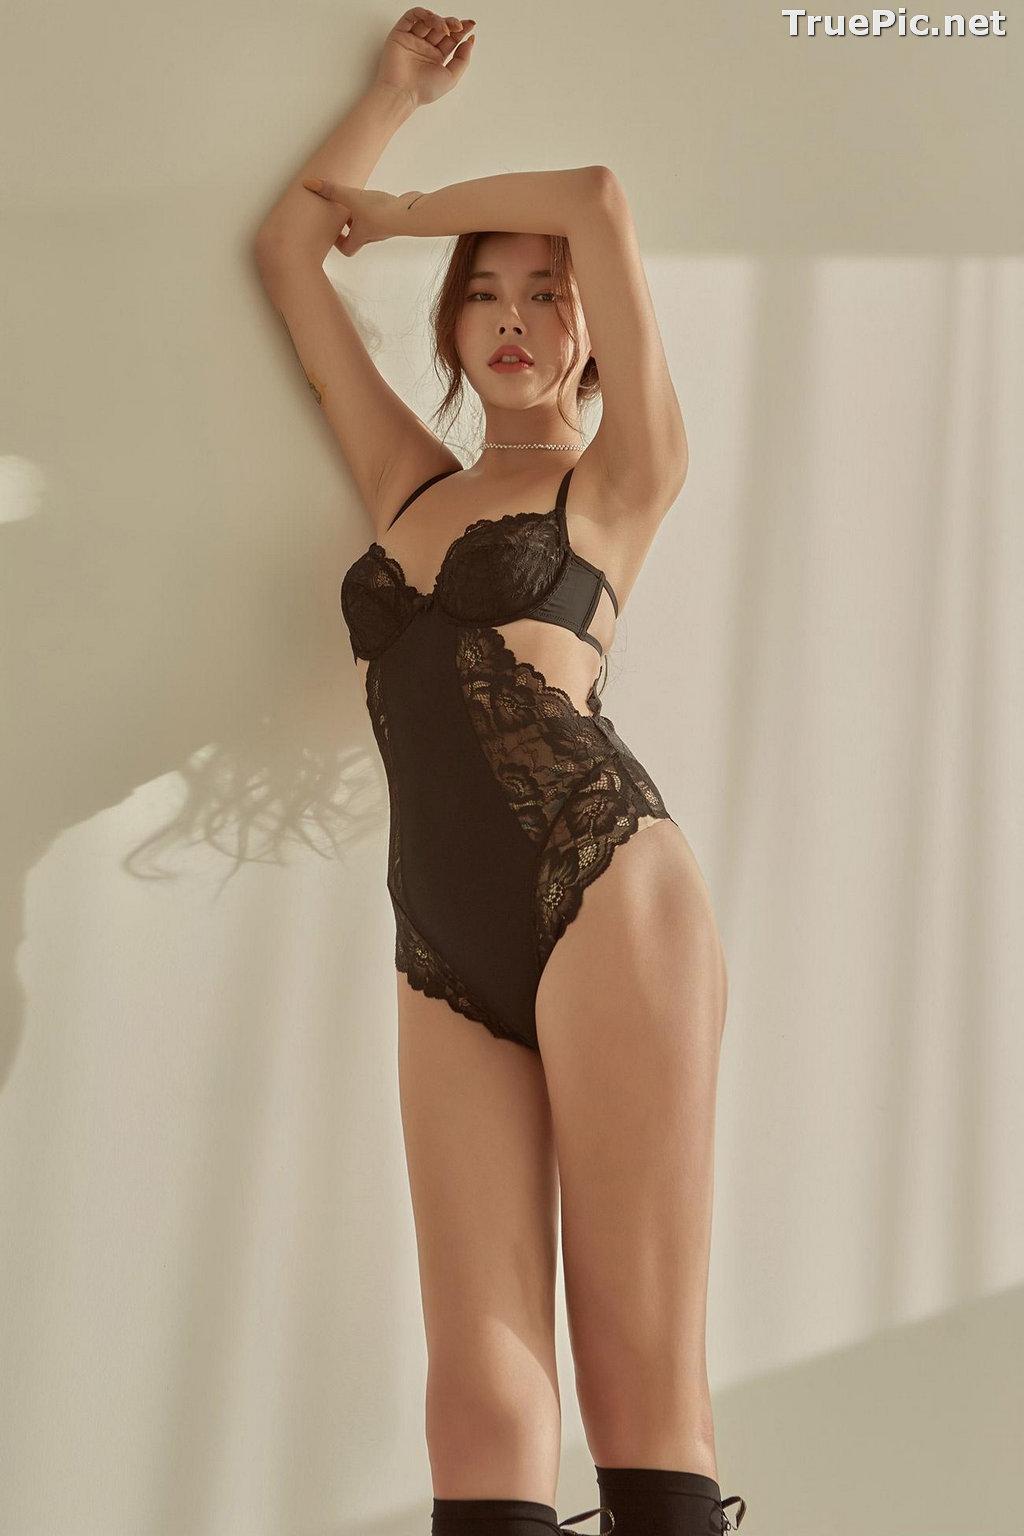 Image Korean Fashion Model - Da Yomi (다요미) - Lountess Spring Lingerie #1 - TruePic.net - Picture-4